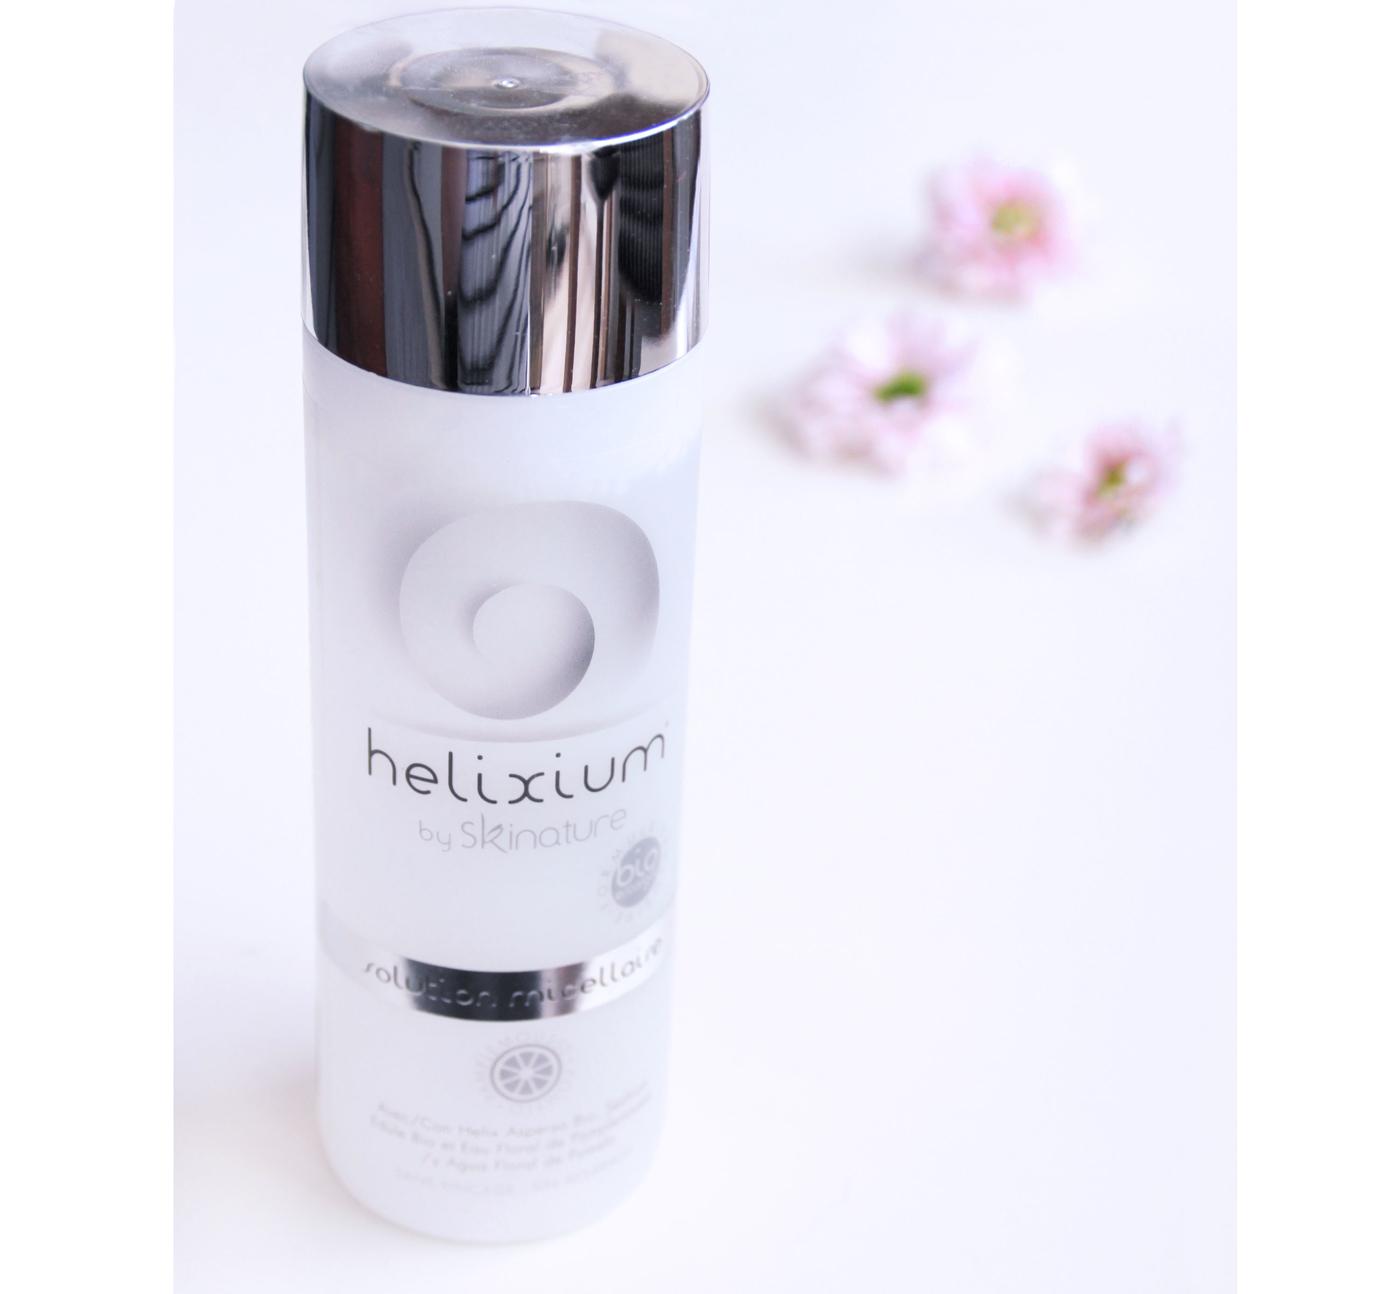 helixium33.jpg